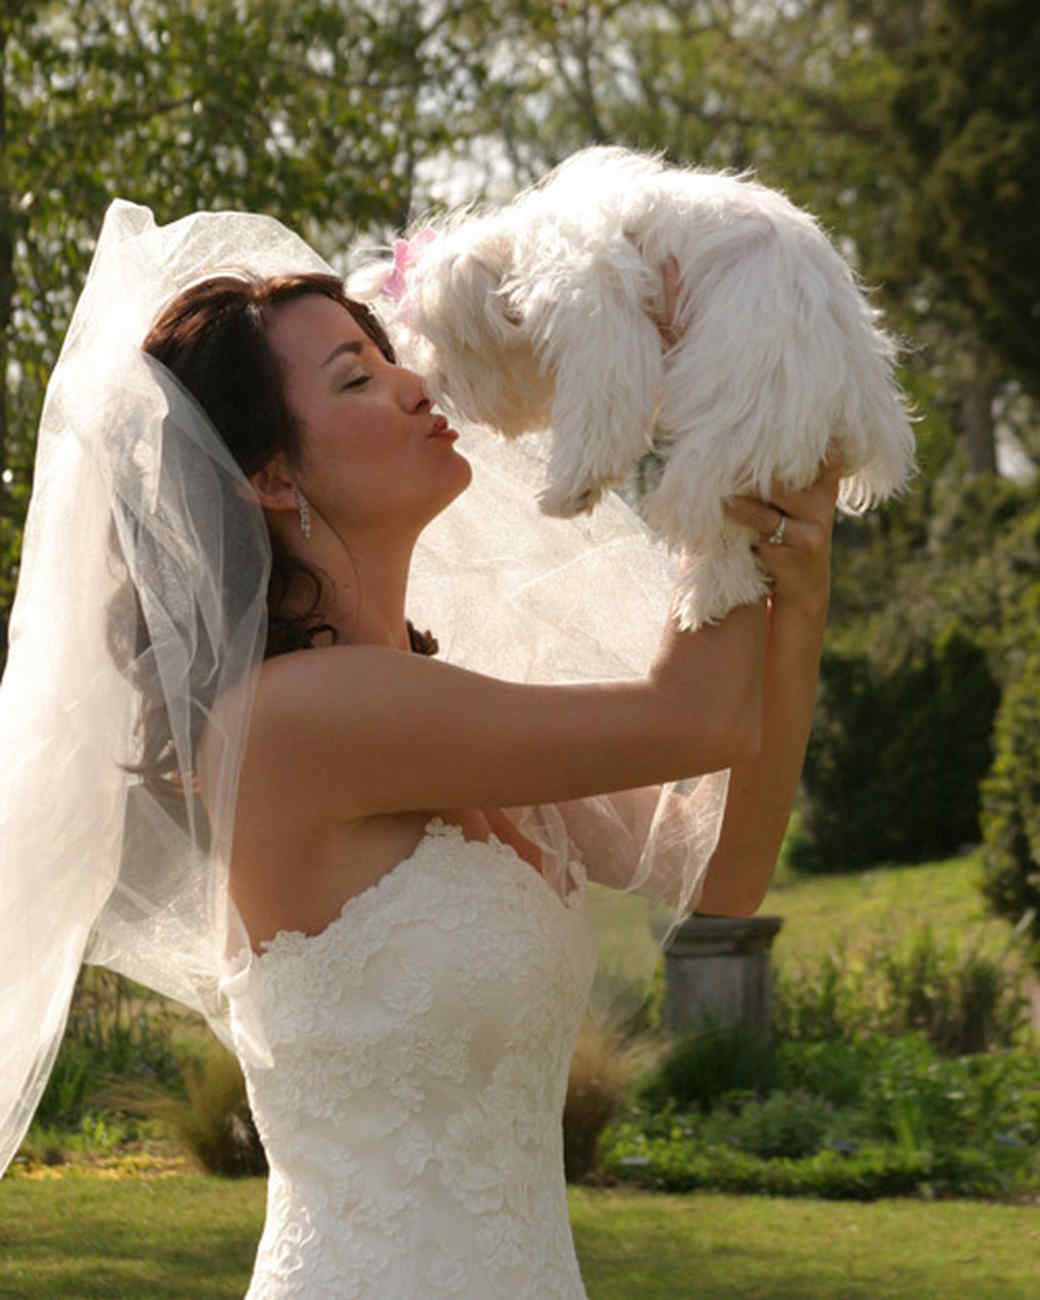 pets_wedding_89721.jpg